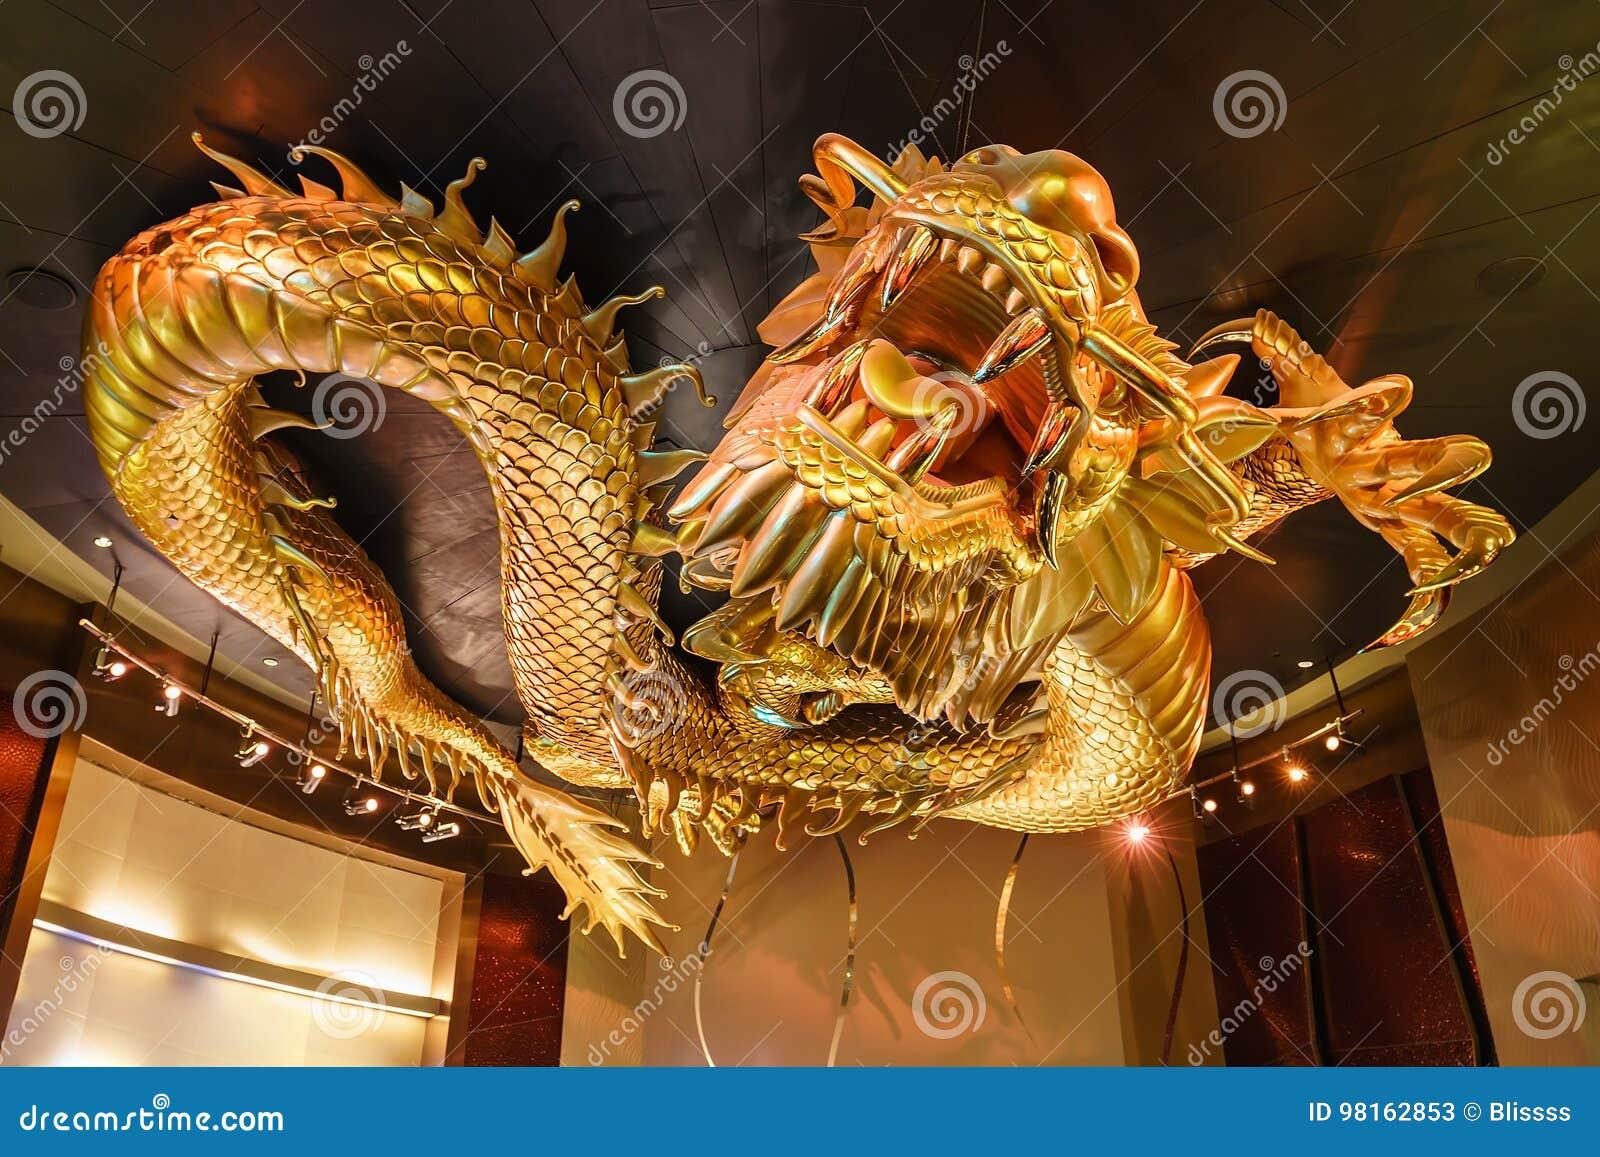 6856244d126e3 City Of Dreams Casino Golden Dragon Chasing Flaming Pearl